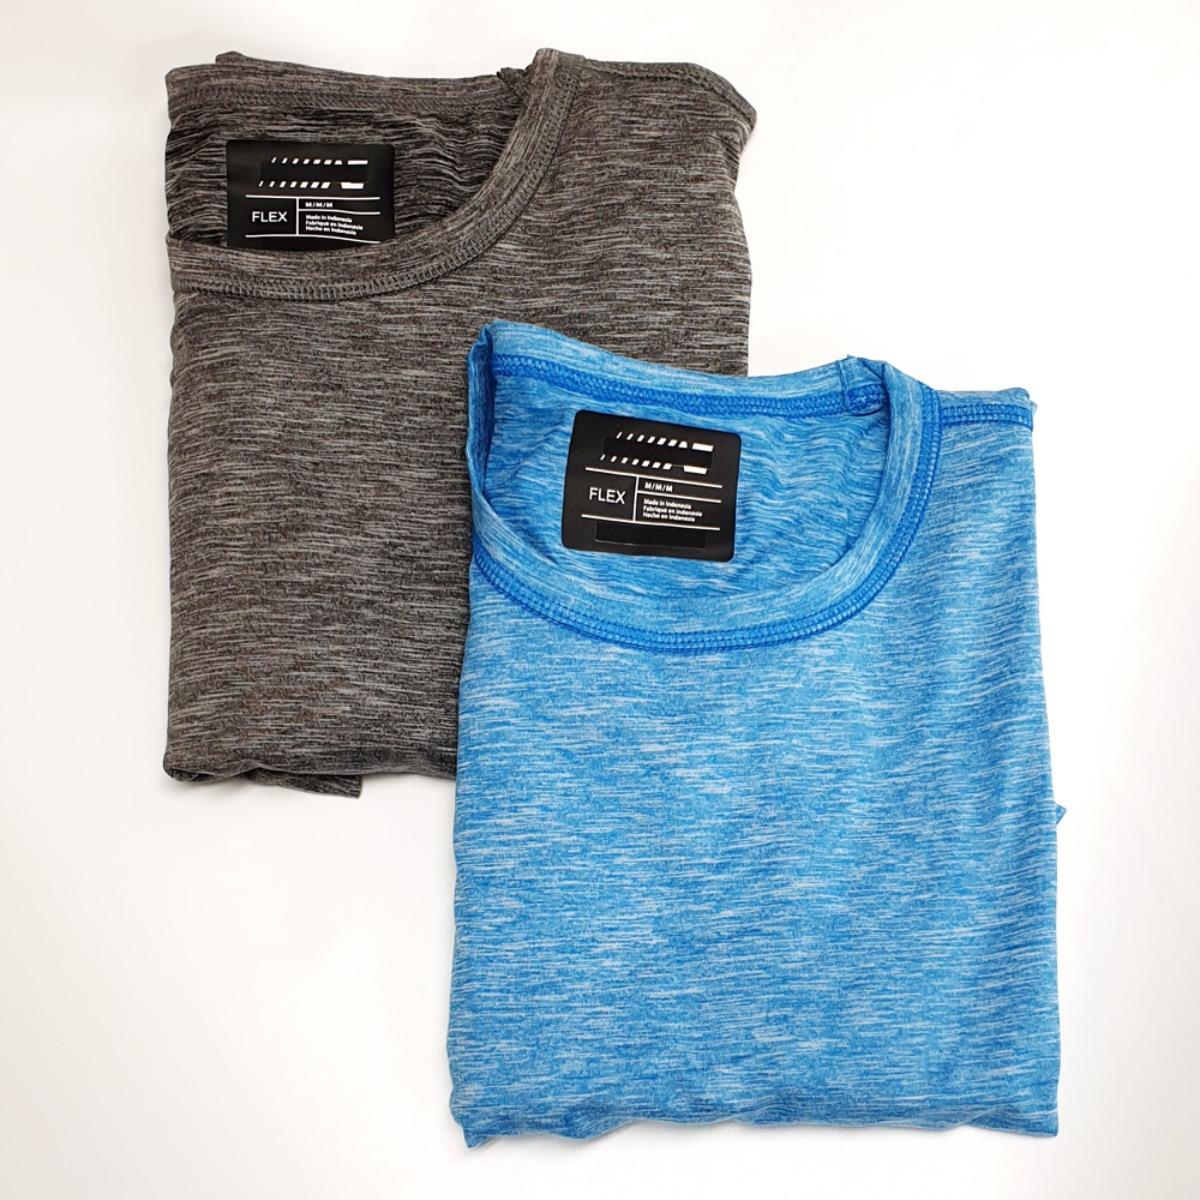 big2b 남녀공용 냉감 쿨 반팔 티셔츠